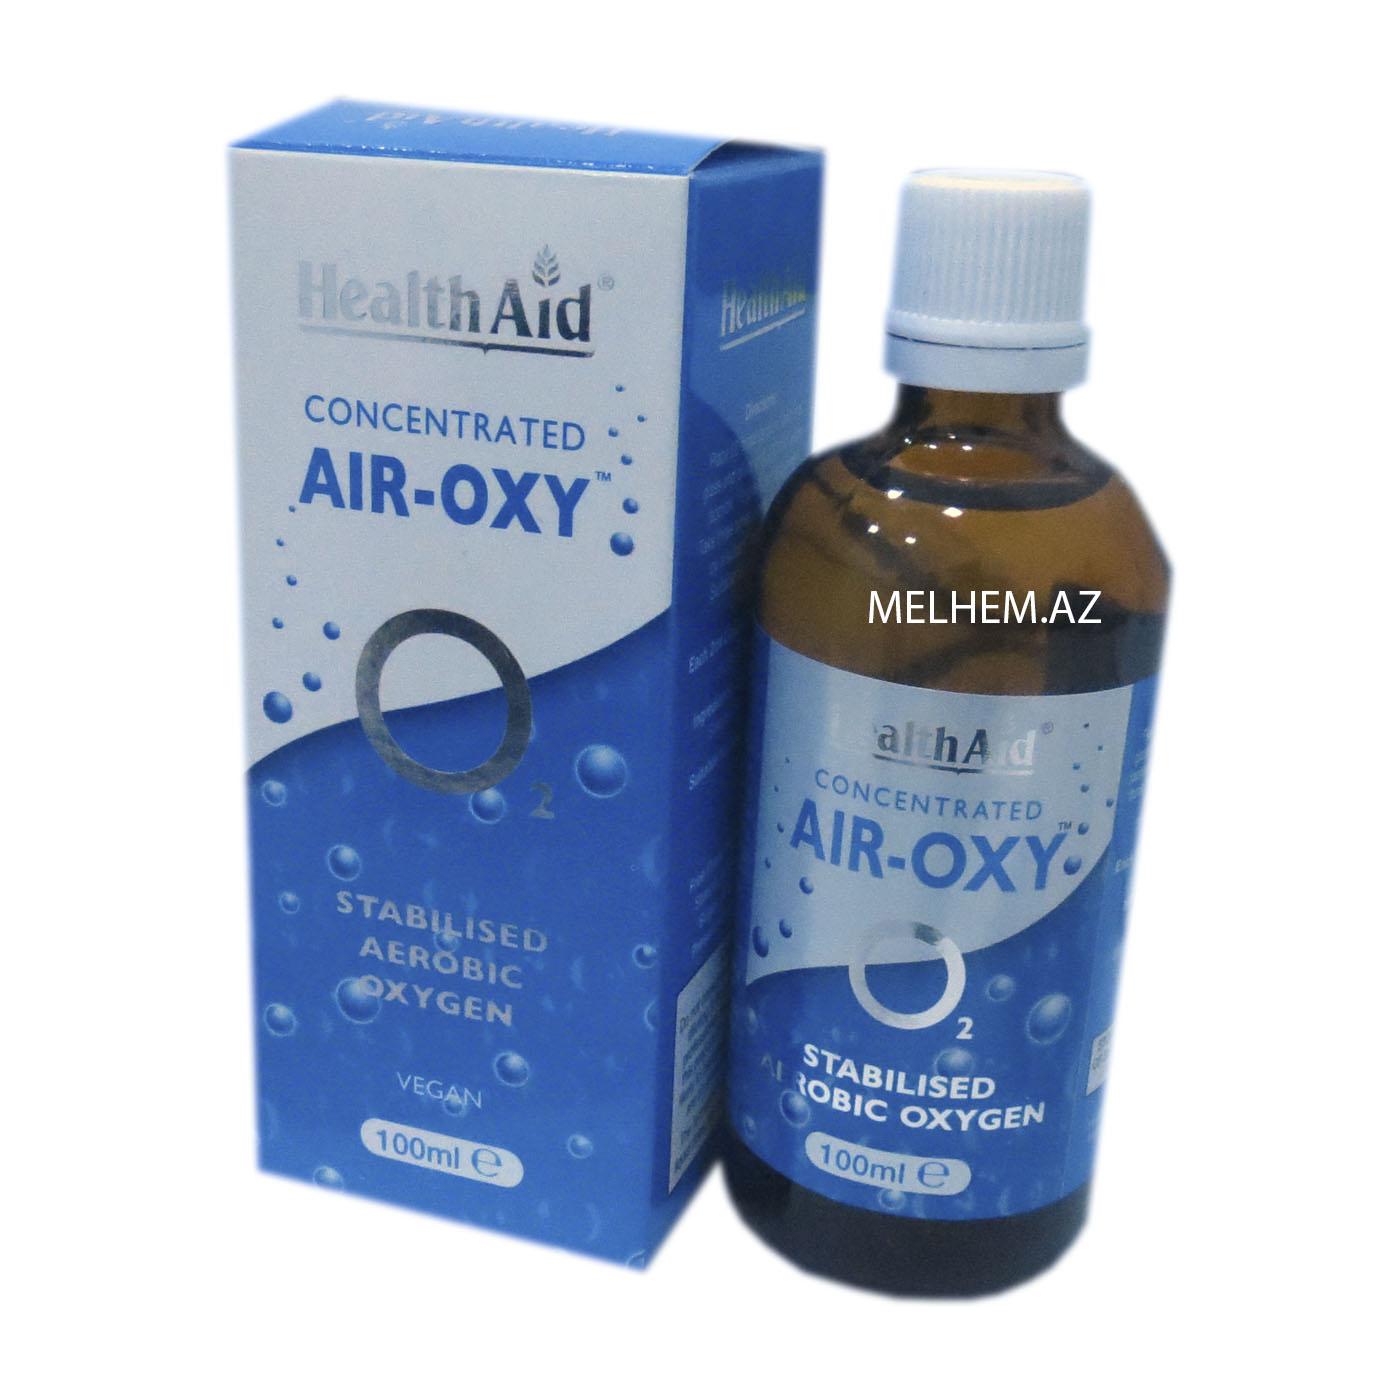 AIR-OXY